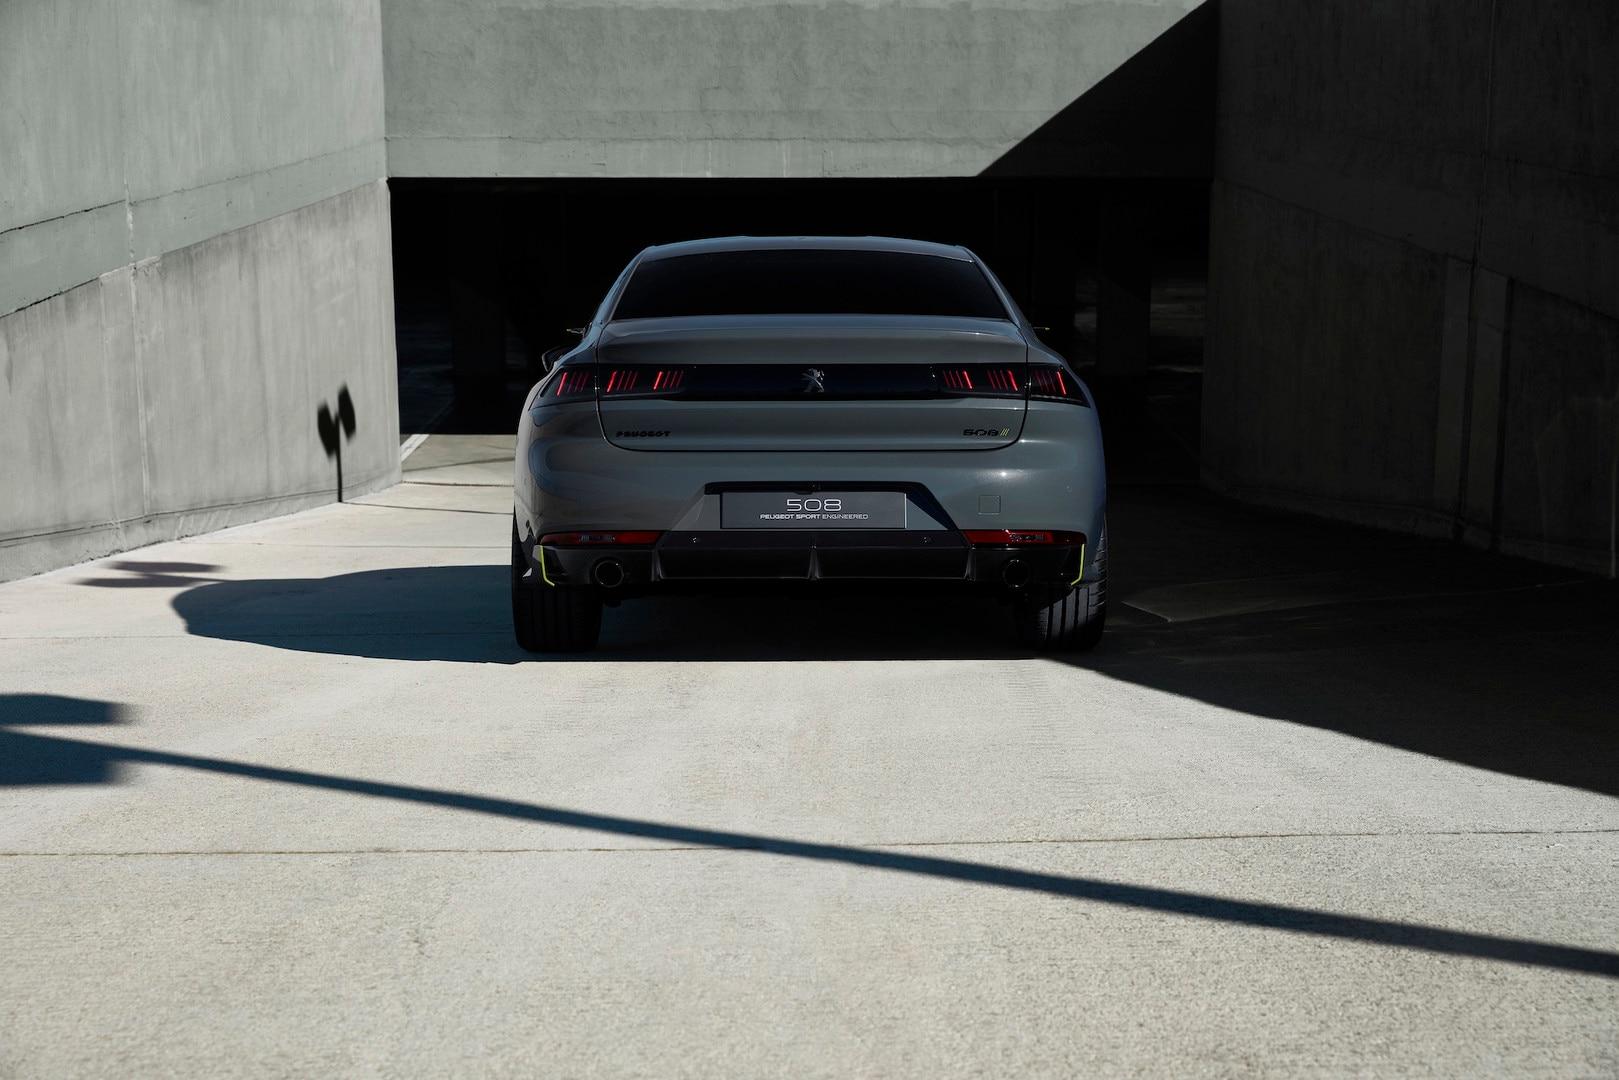 508 sport hybrid